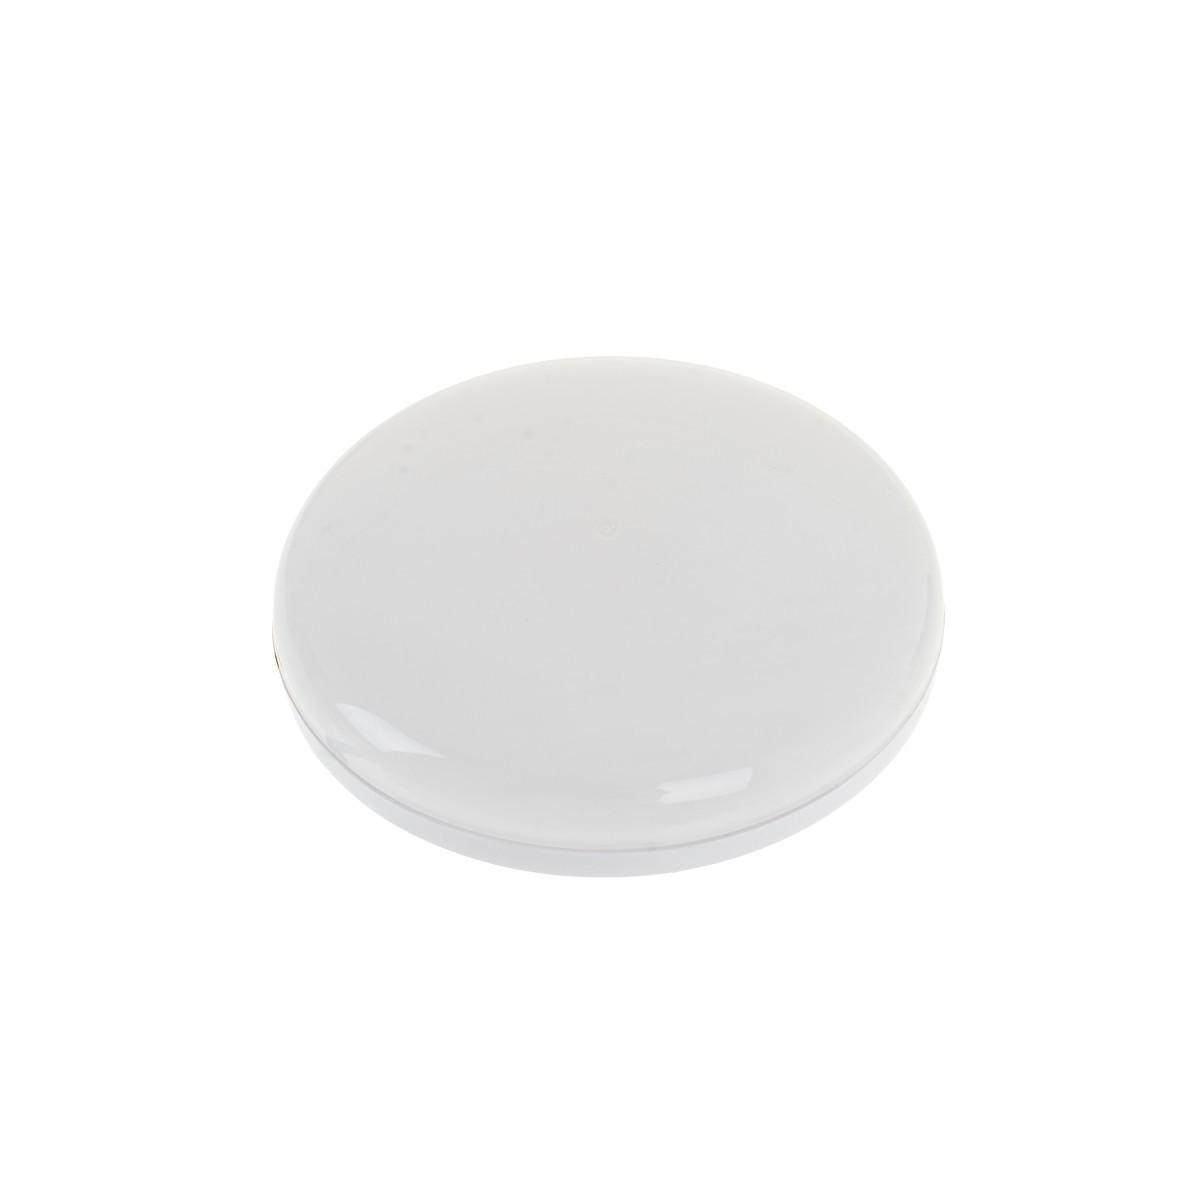 LED-471/18W NW накладной светильник